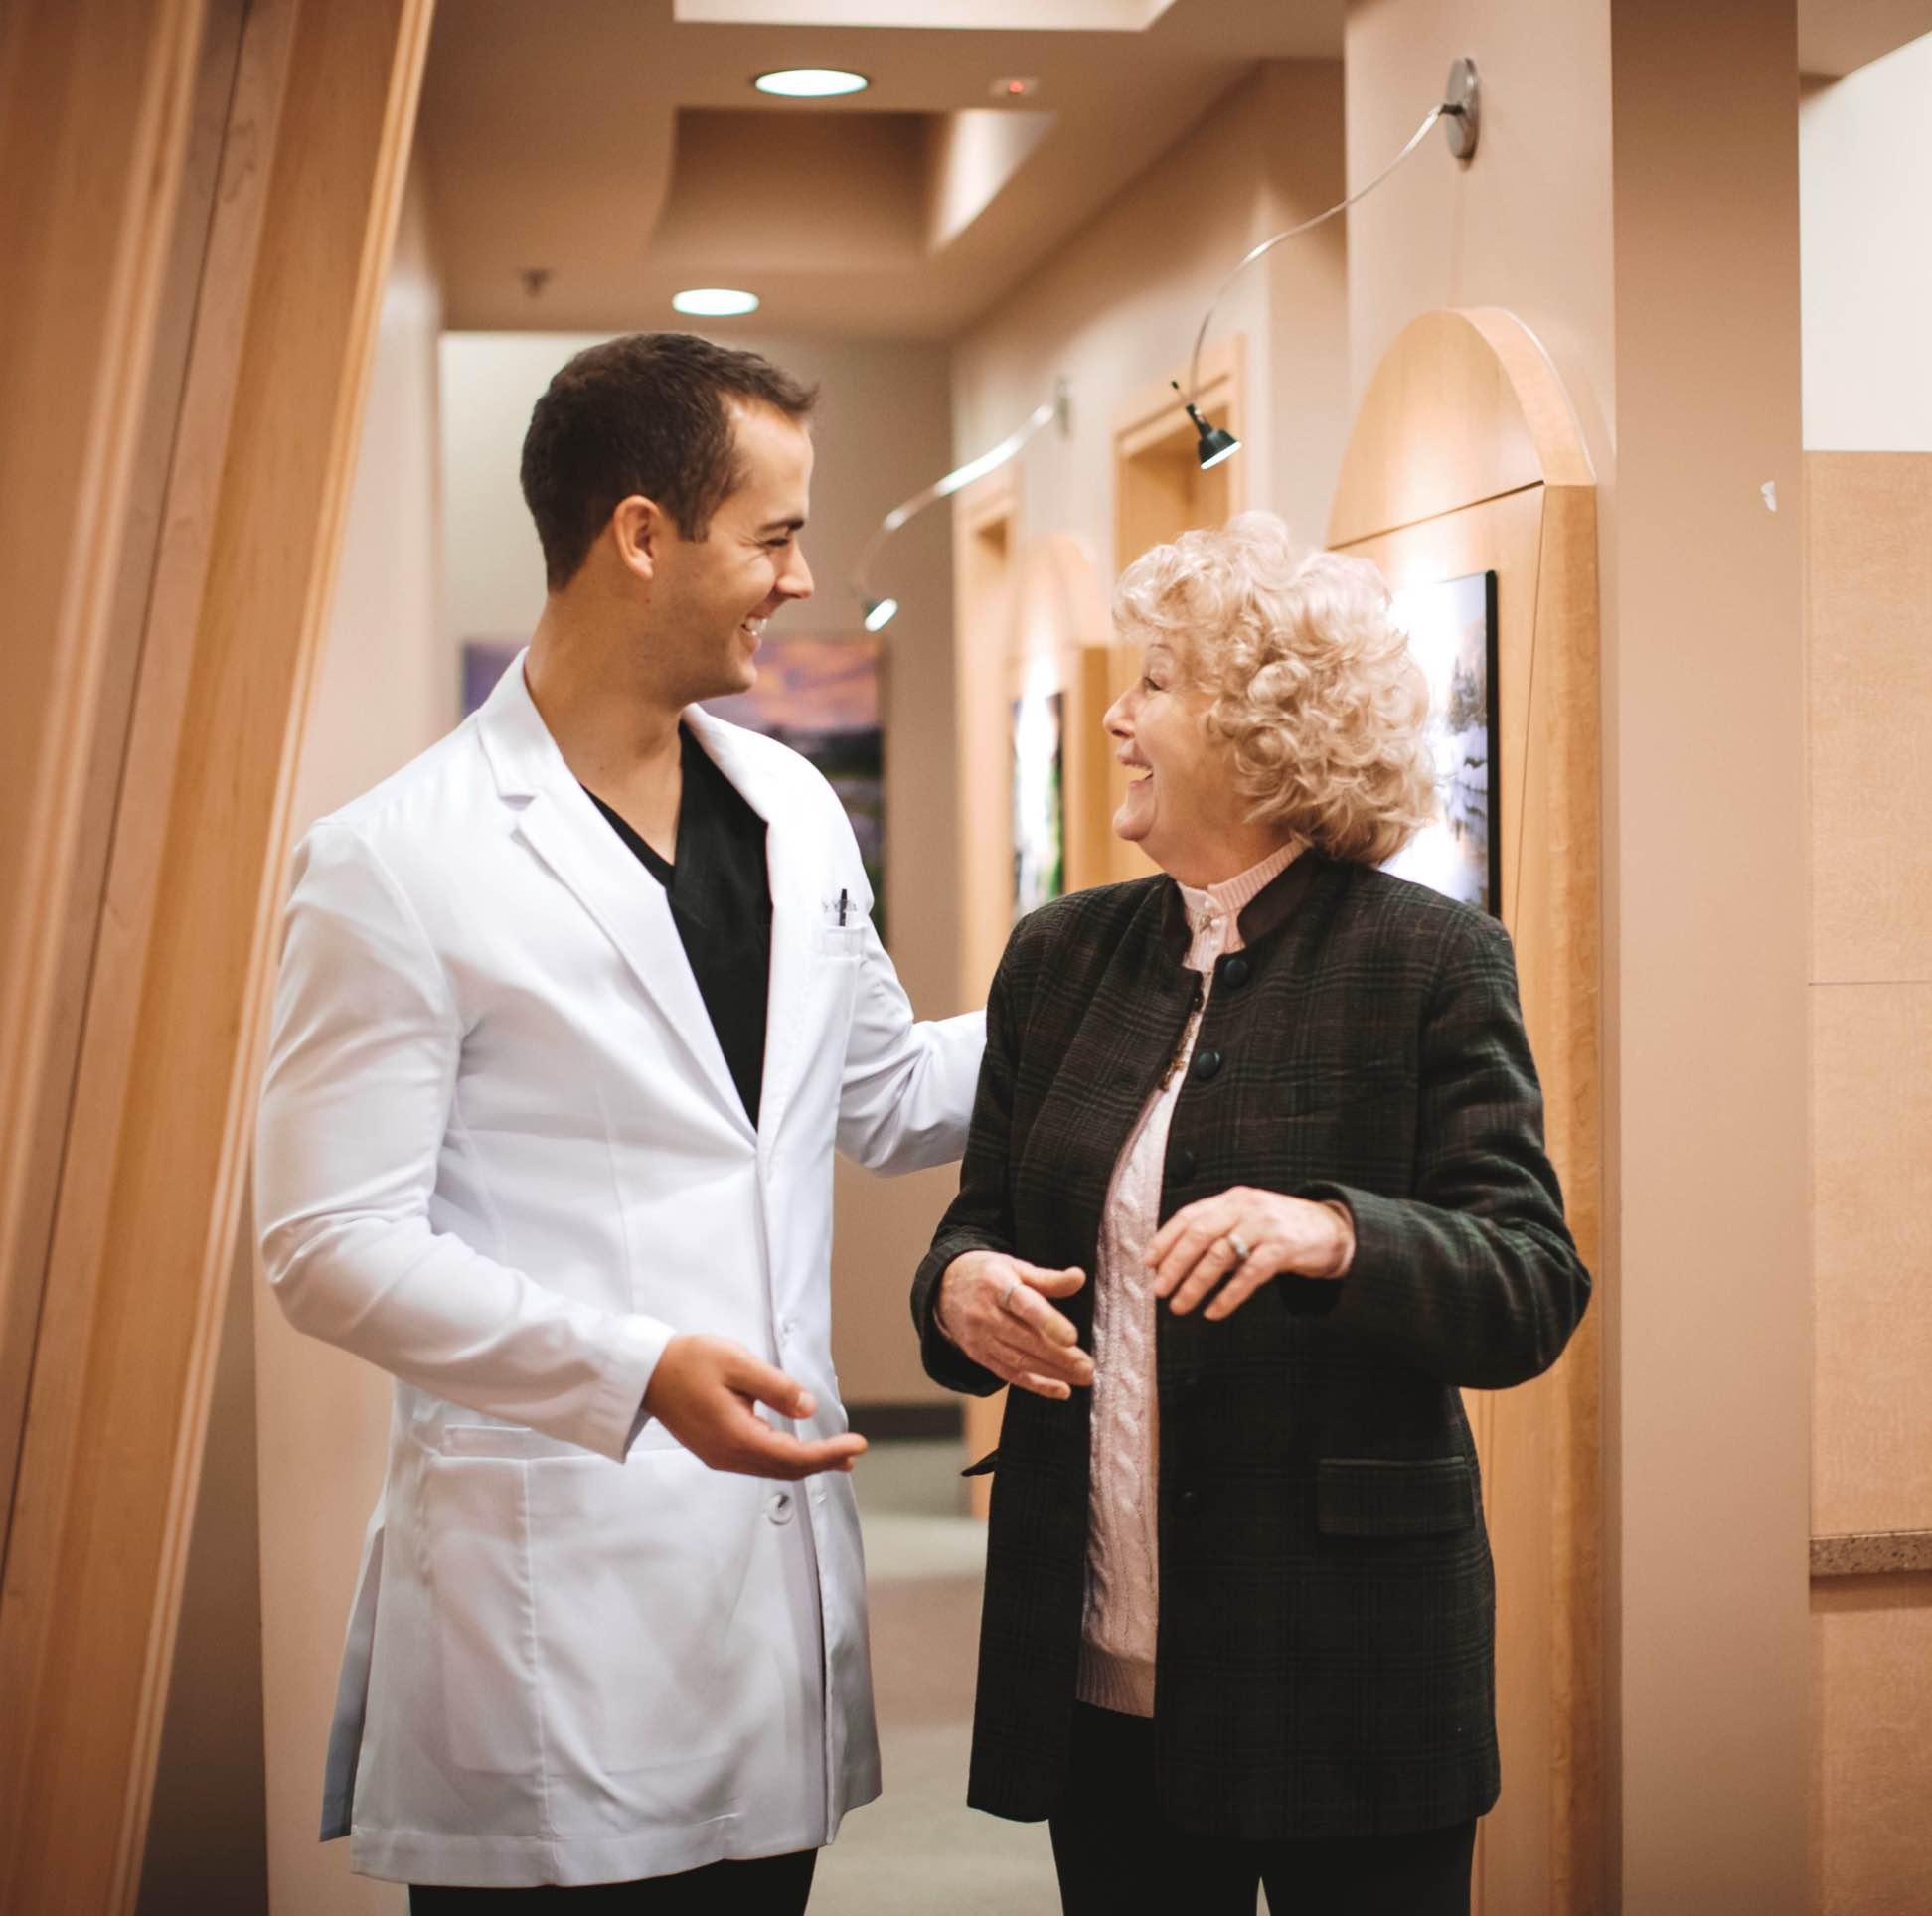 Photo of Dr. Jordan walking beside a smiling patient